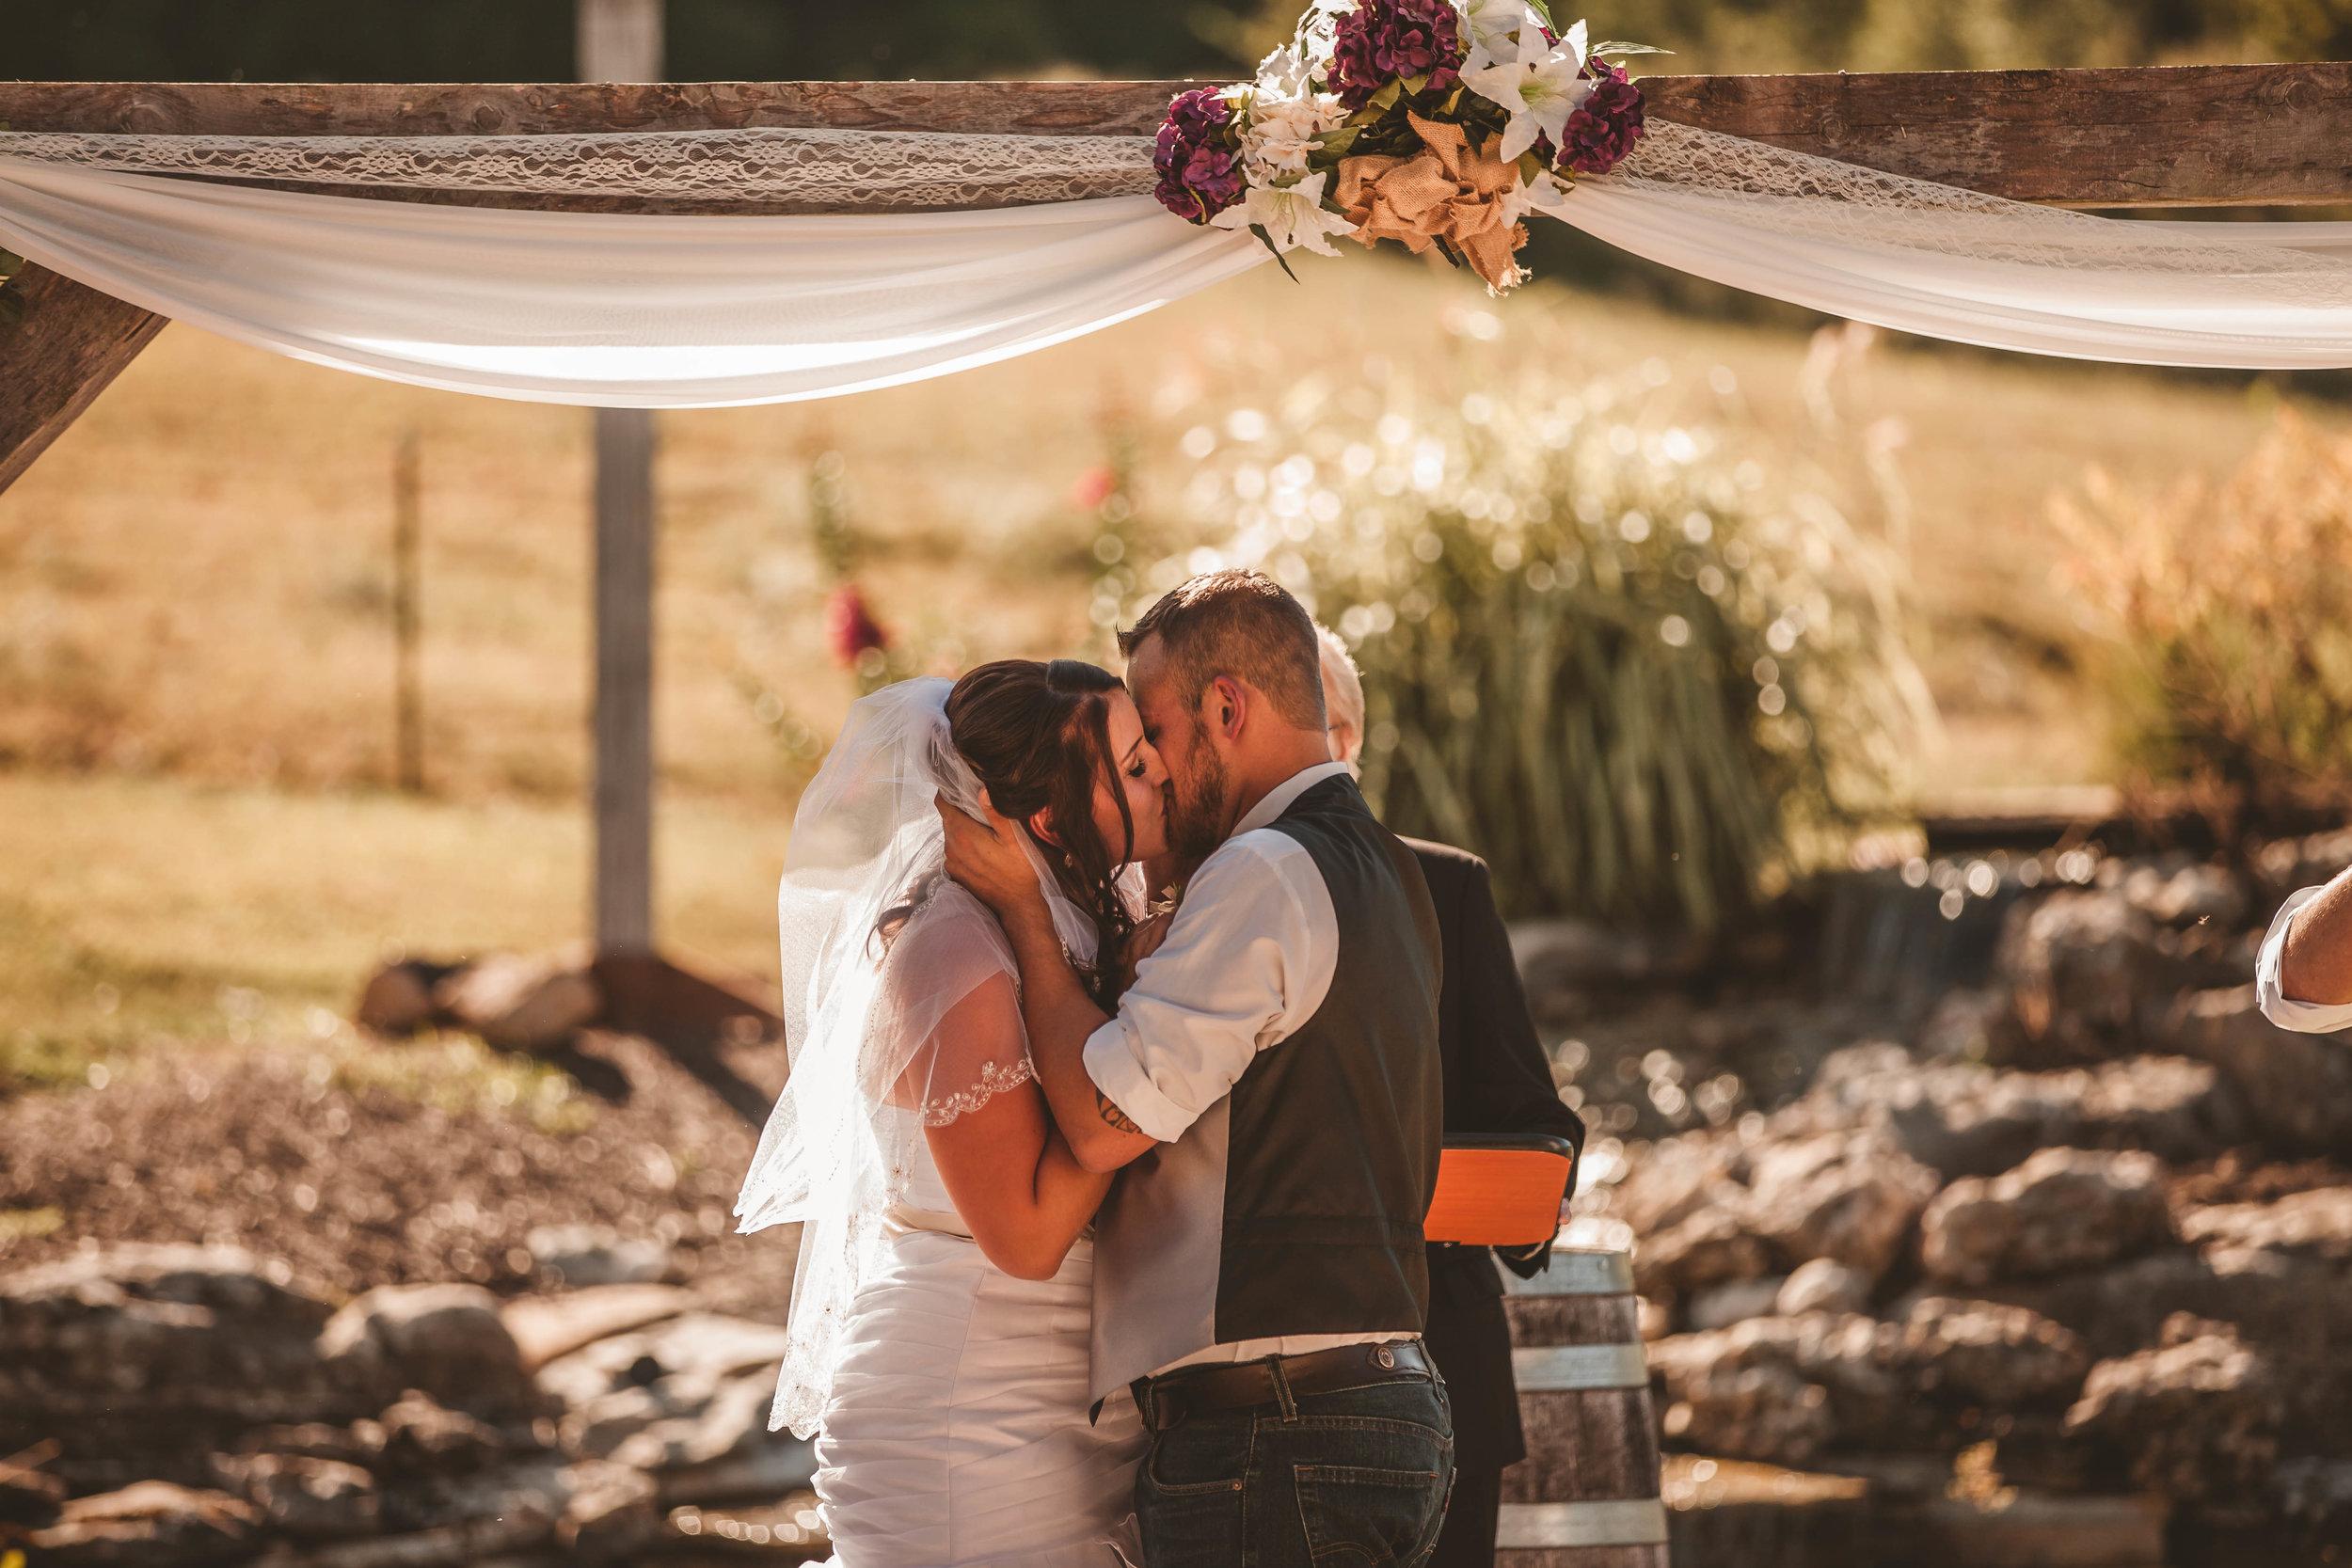 jessica & brett - wedding & reception @ rocking j ranch